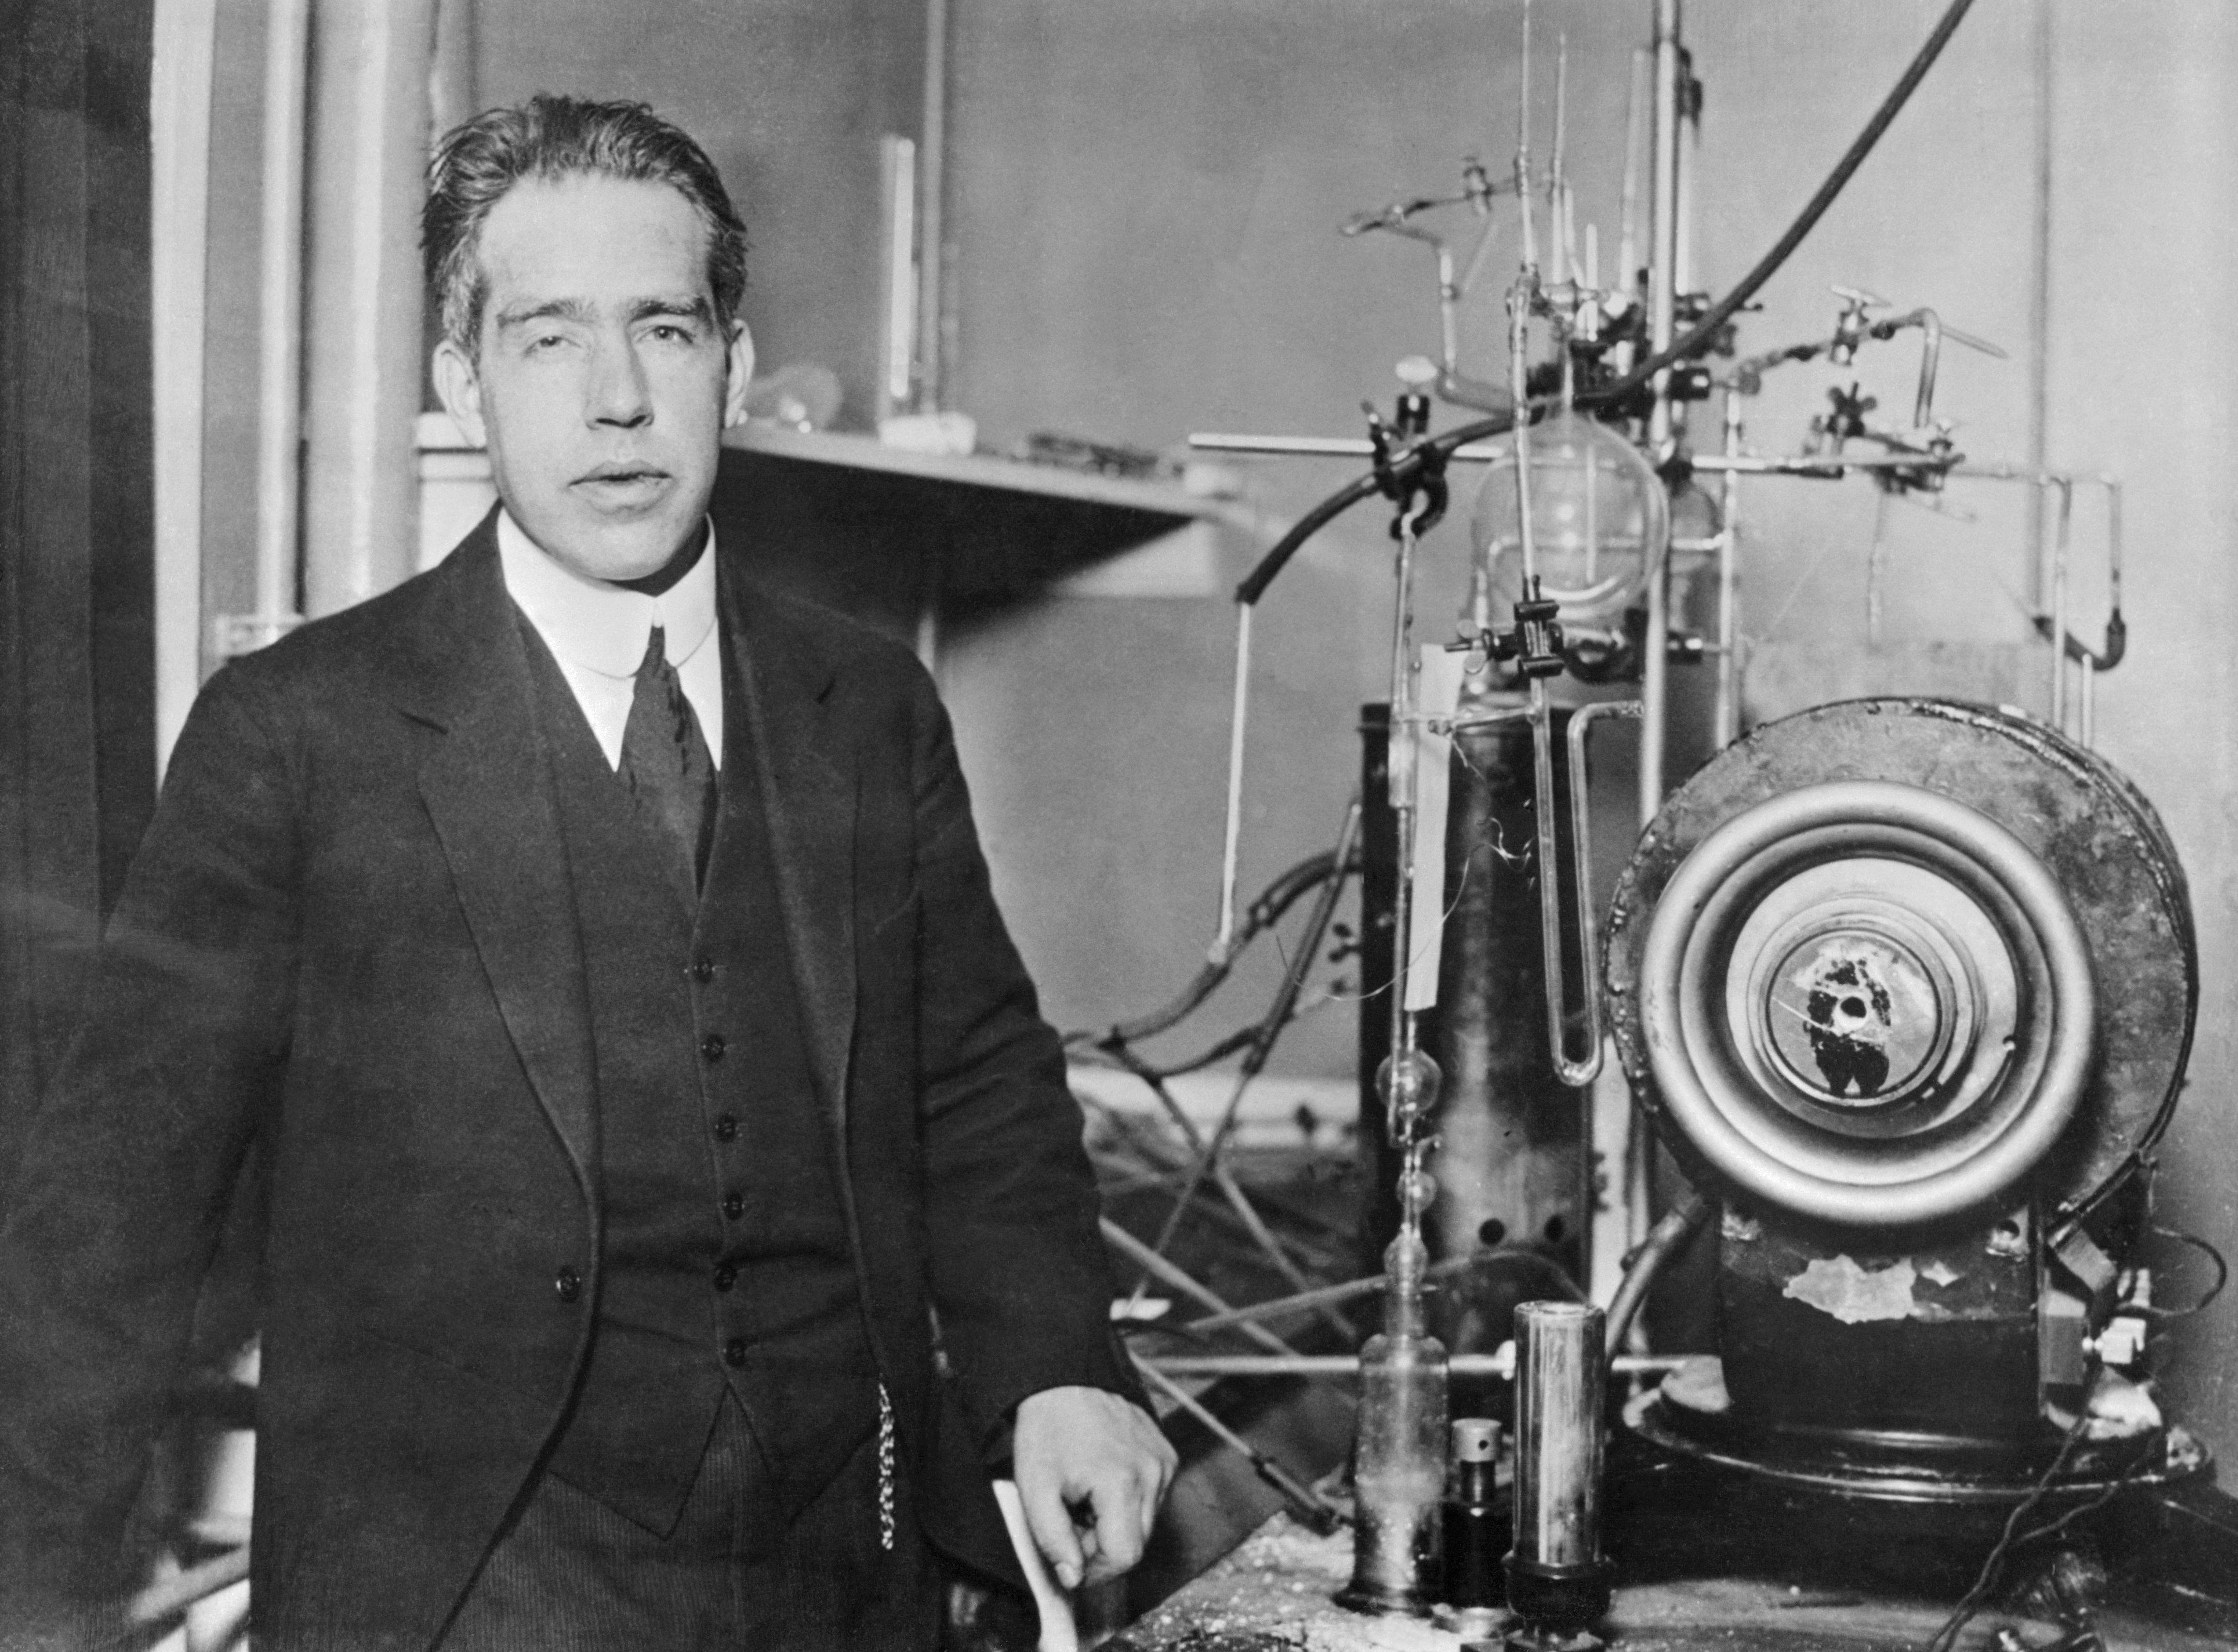 Physicist Niels Bohr